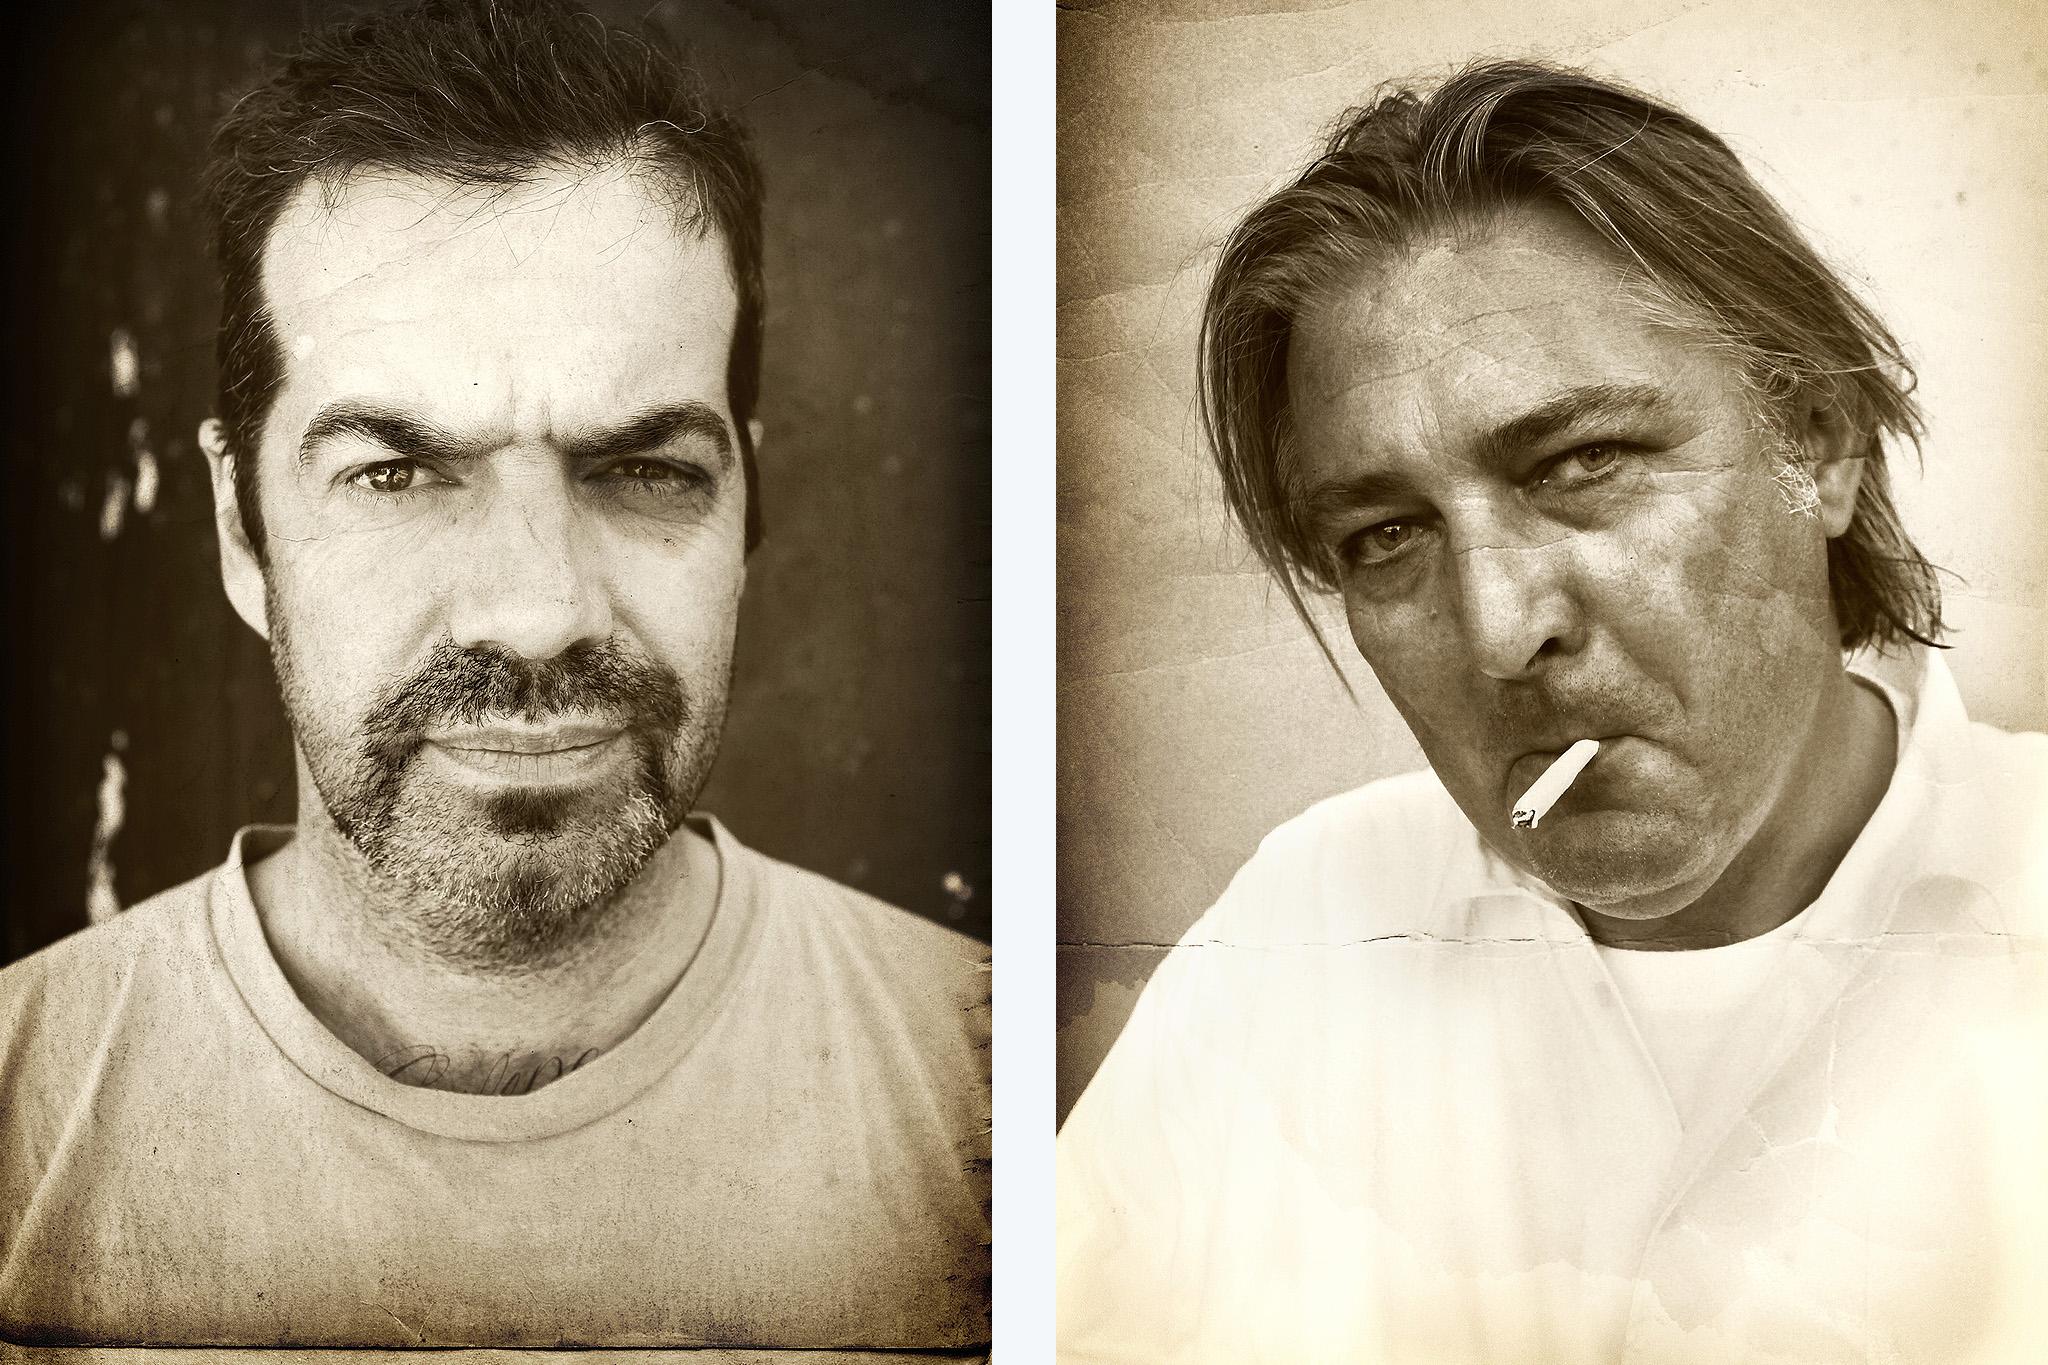 06_Alcatraz_Porträts